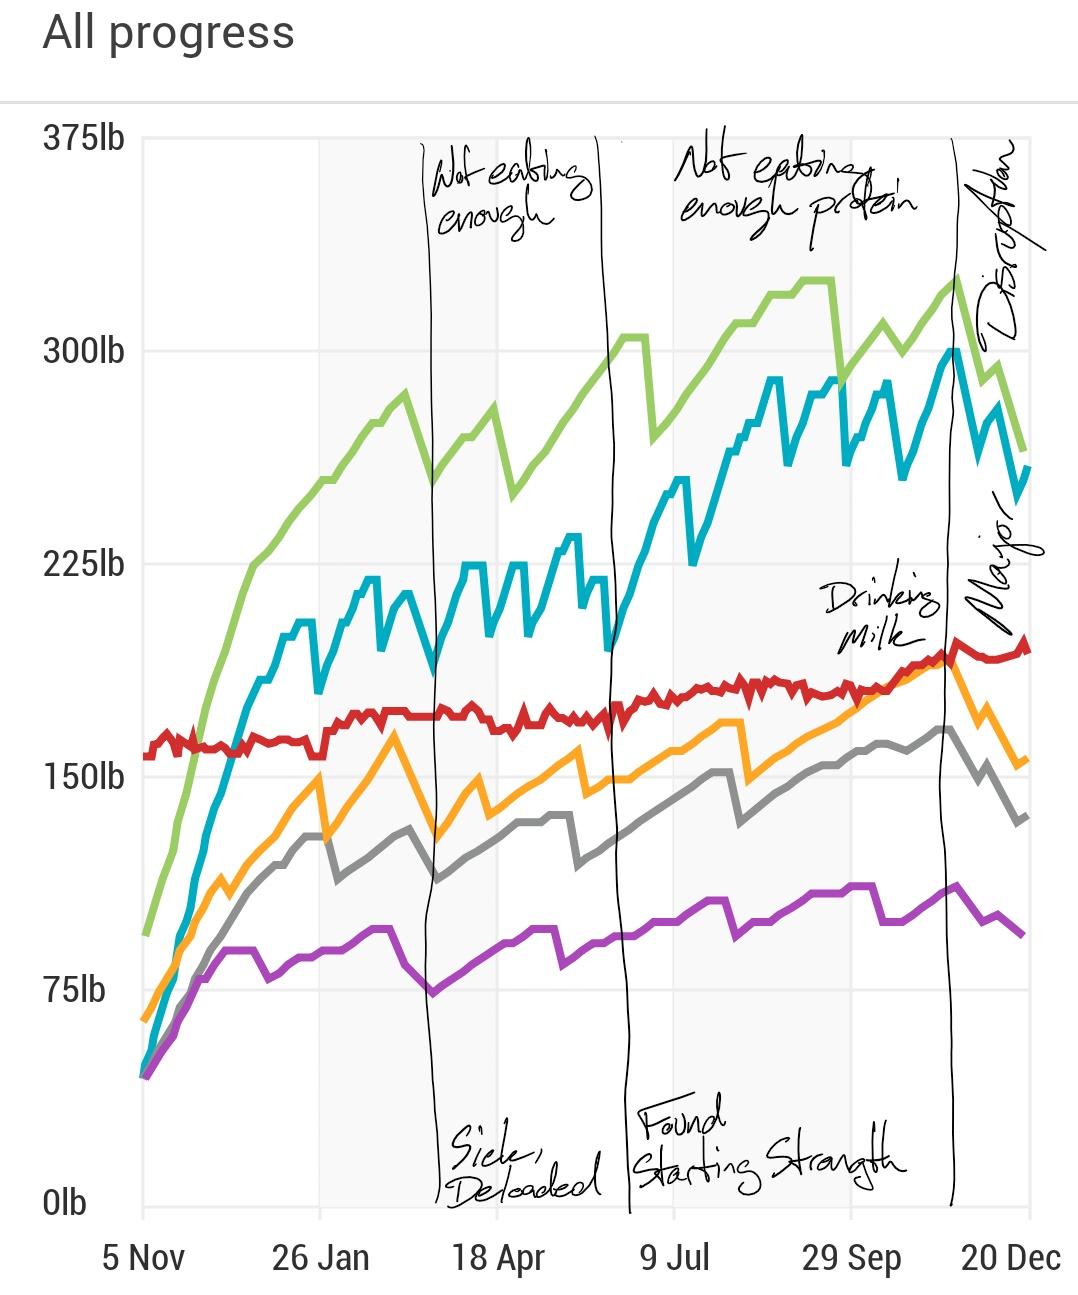 Key, from top the bottom: deadlift (green), squat (blue), bodyweight (red), barbell row (orange), bench press (gray), overhead press (purple).